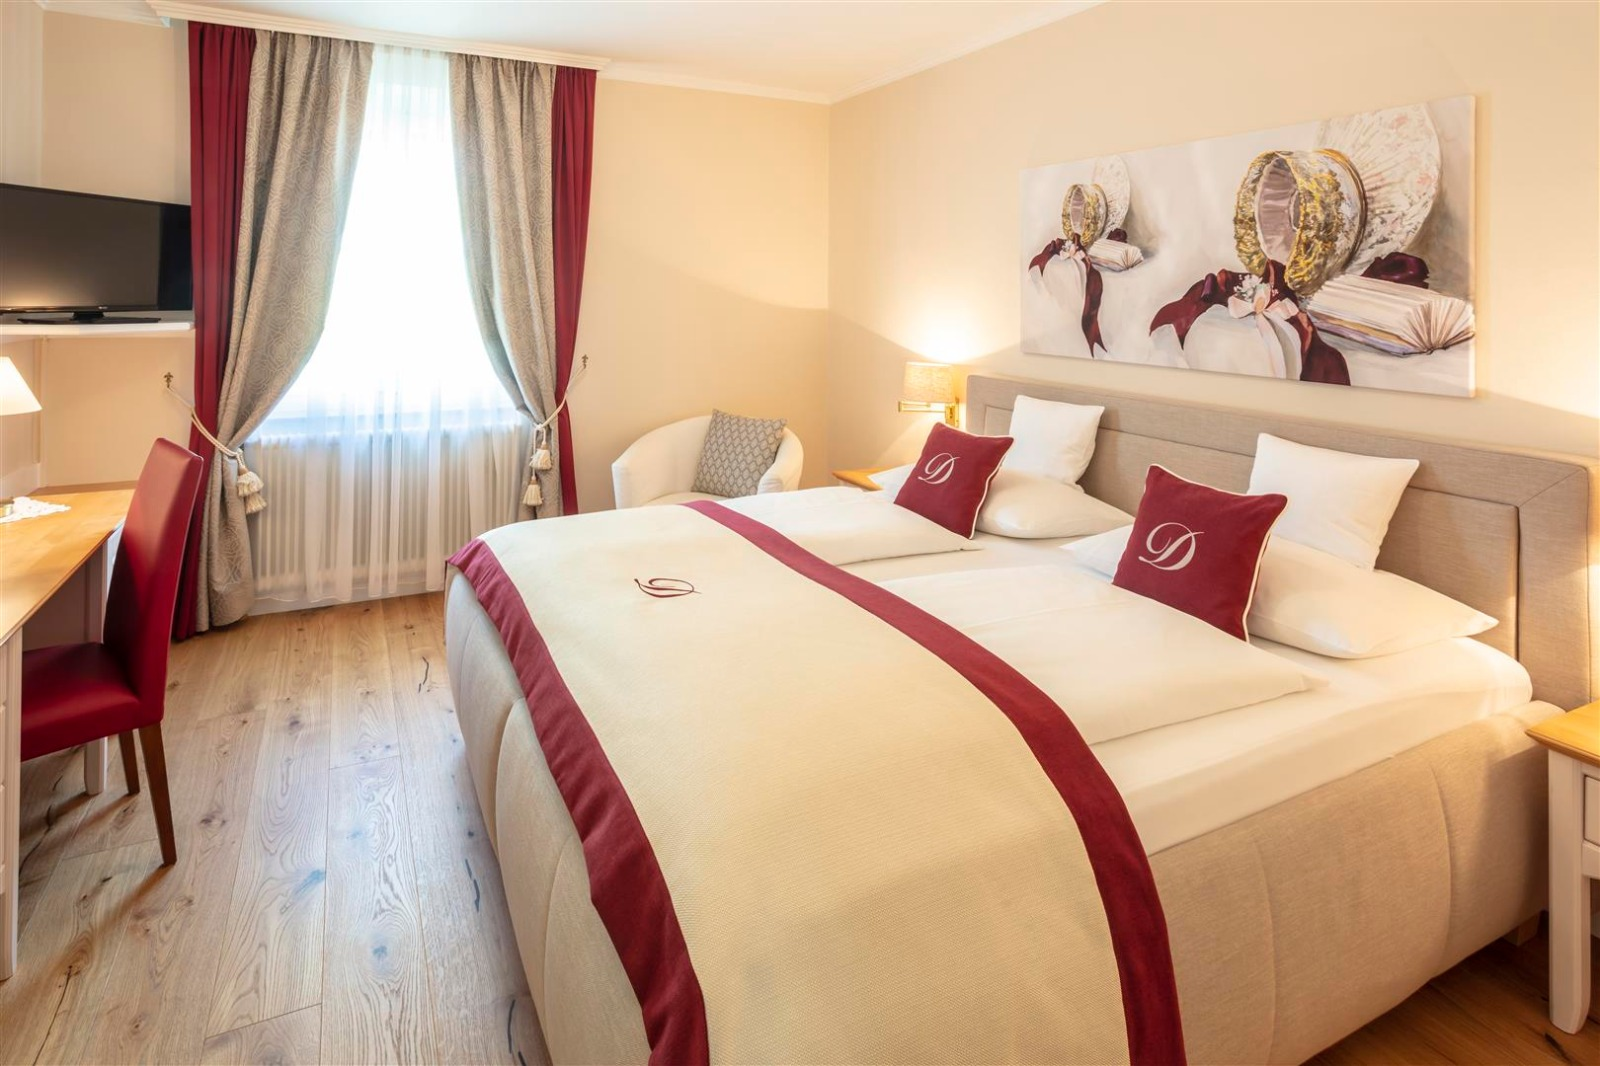 Hotel-/Zimmerfotos Hotel garni DONAUHOF